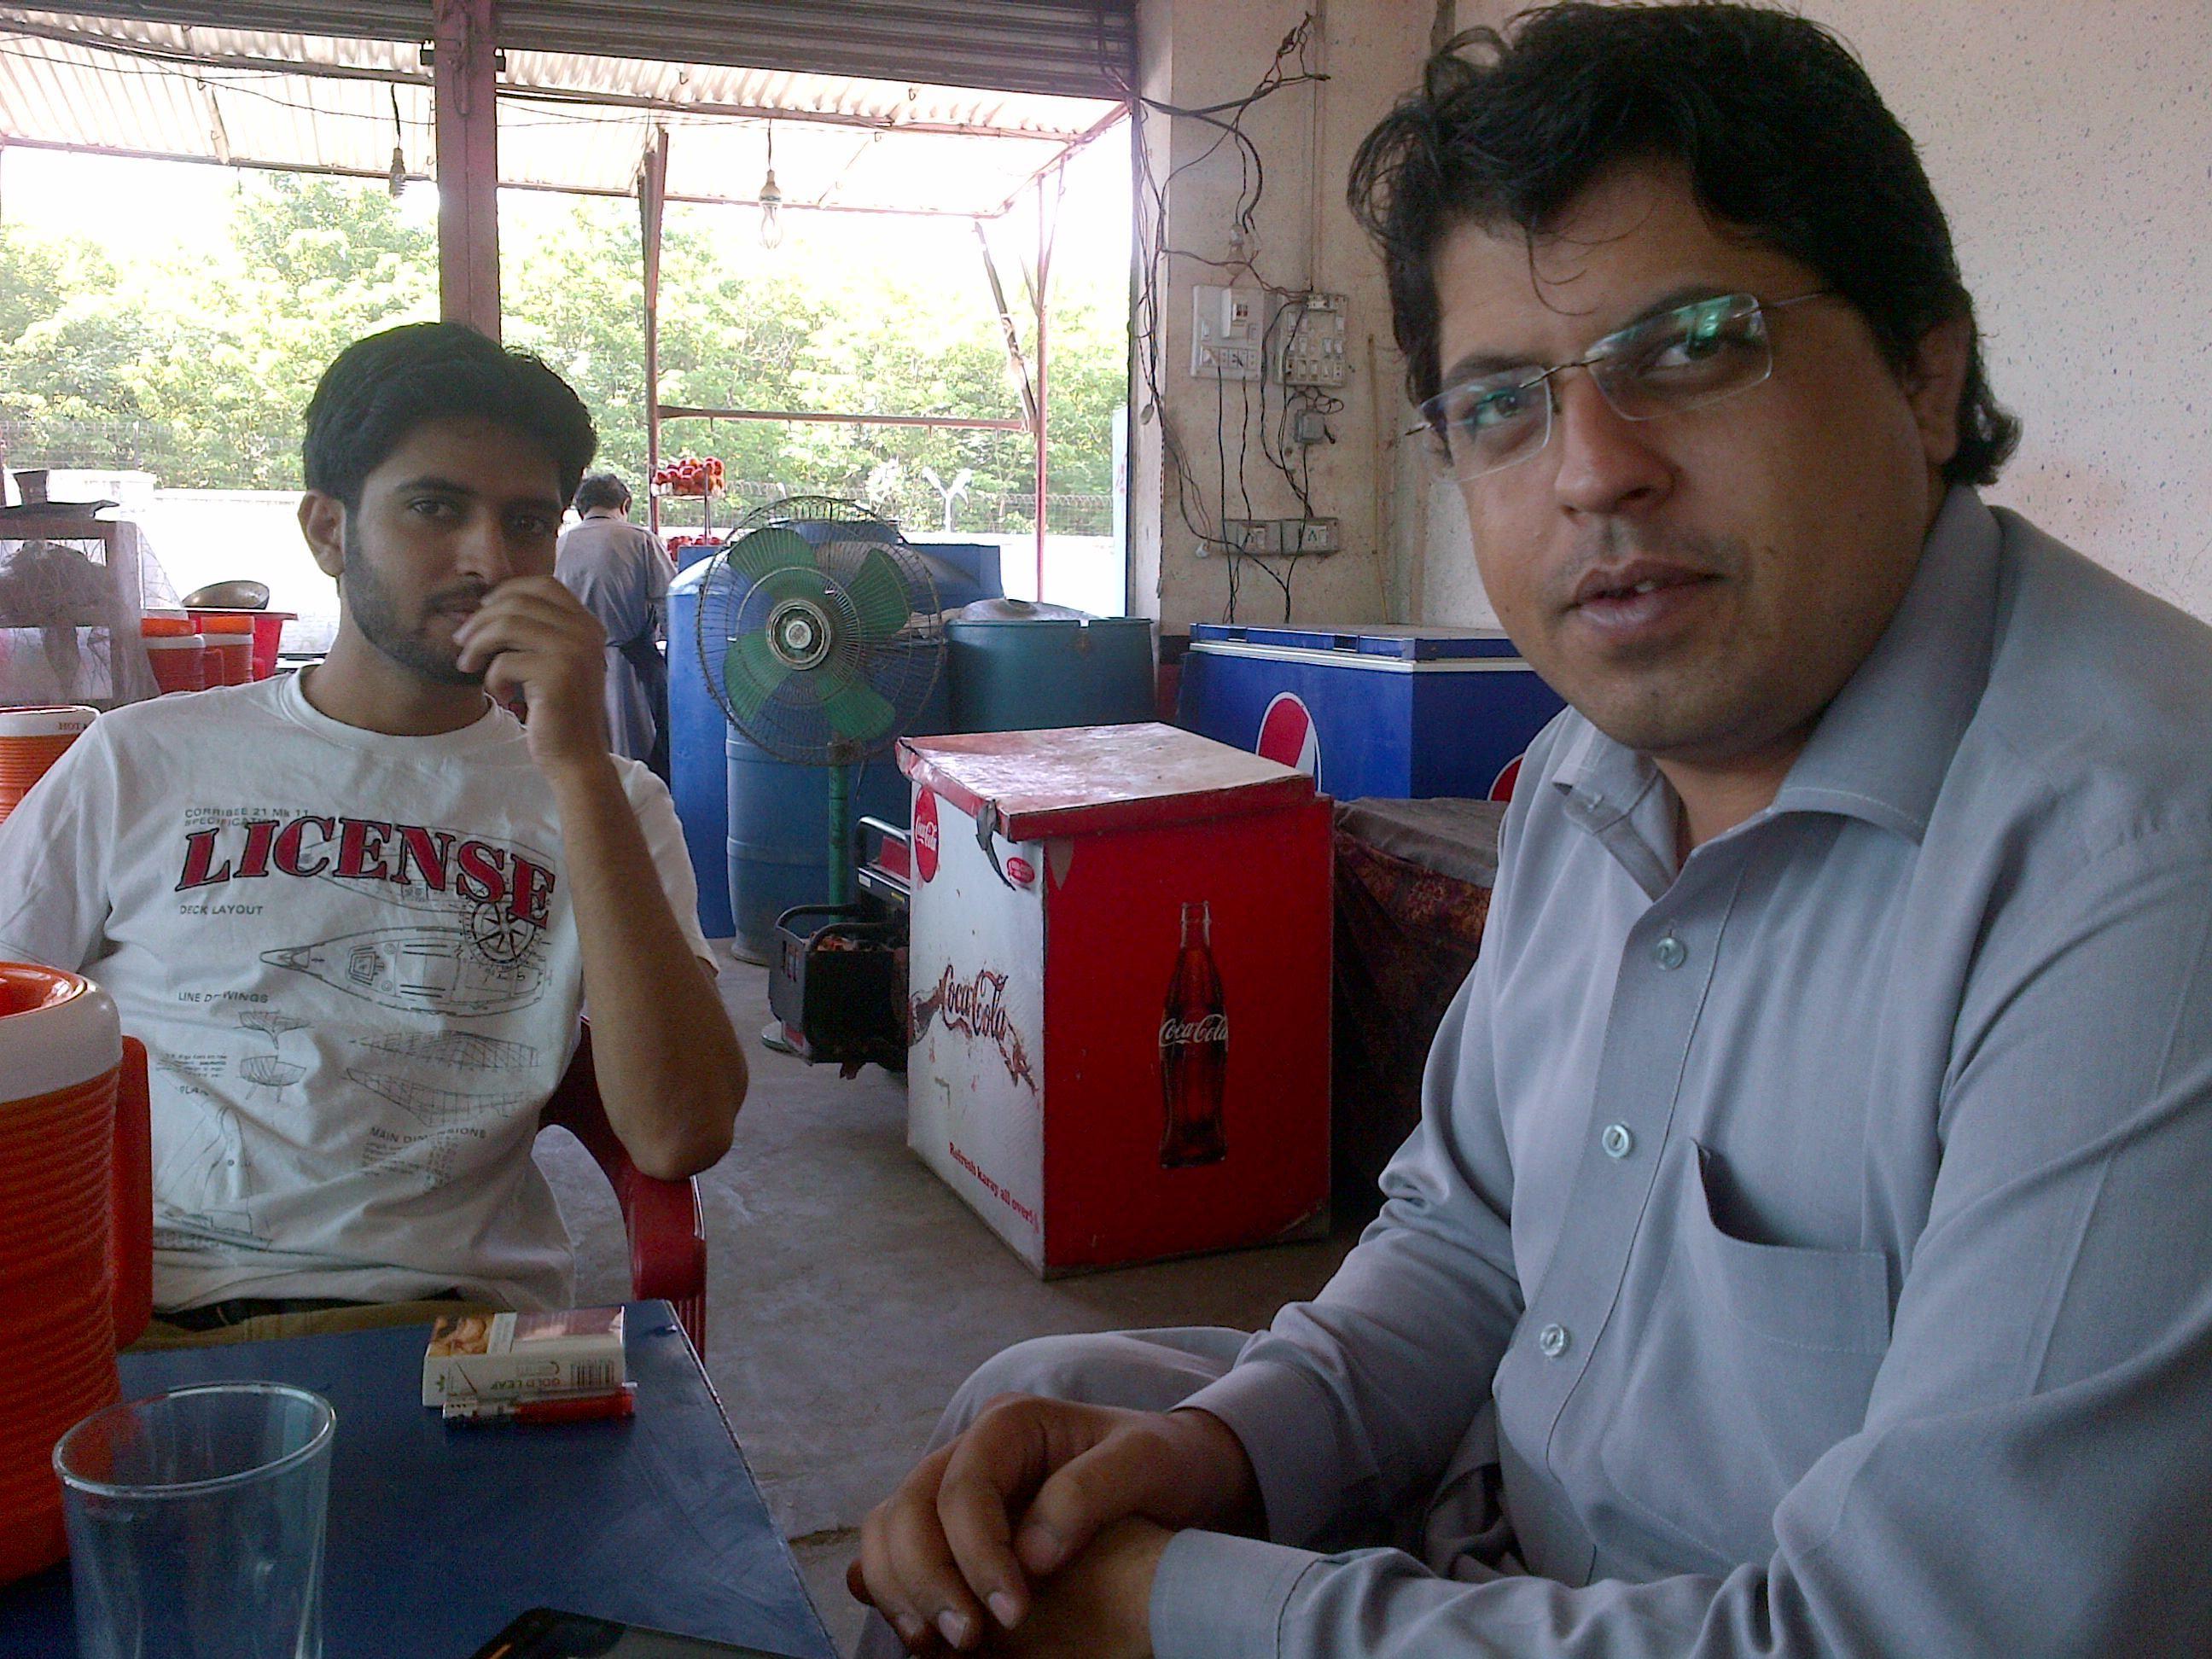 Breakfast: Khattakkum with Rashid Minhas in background